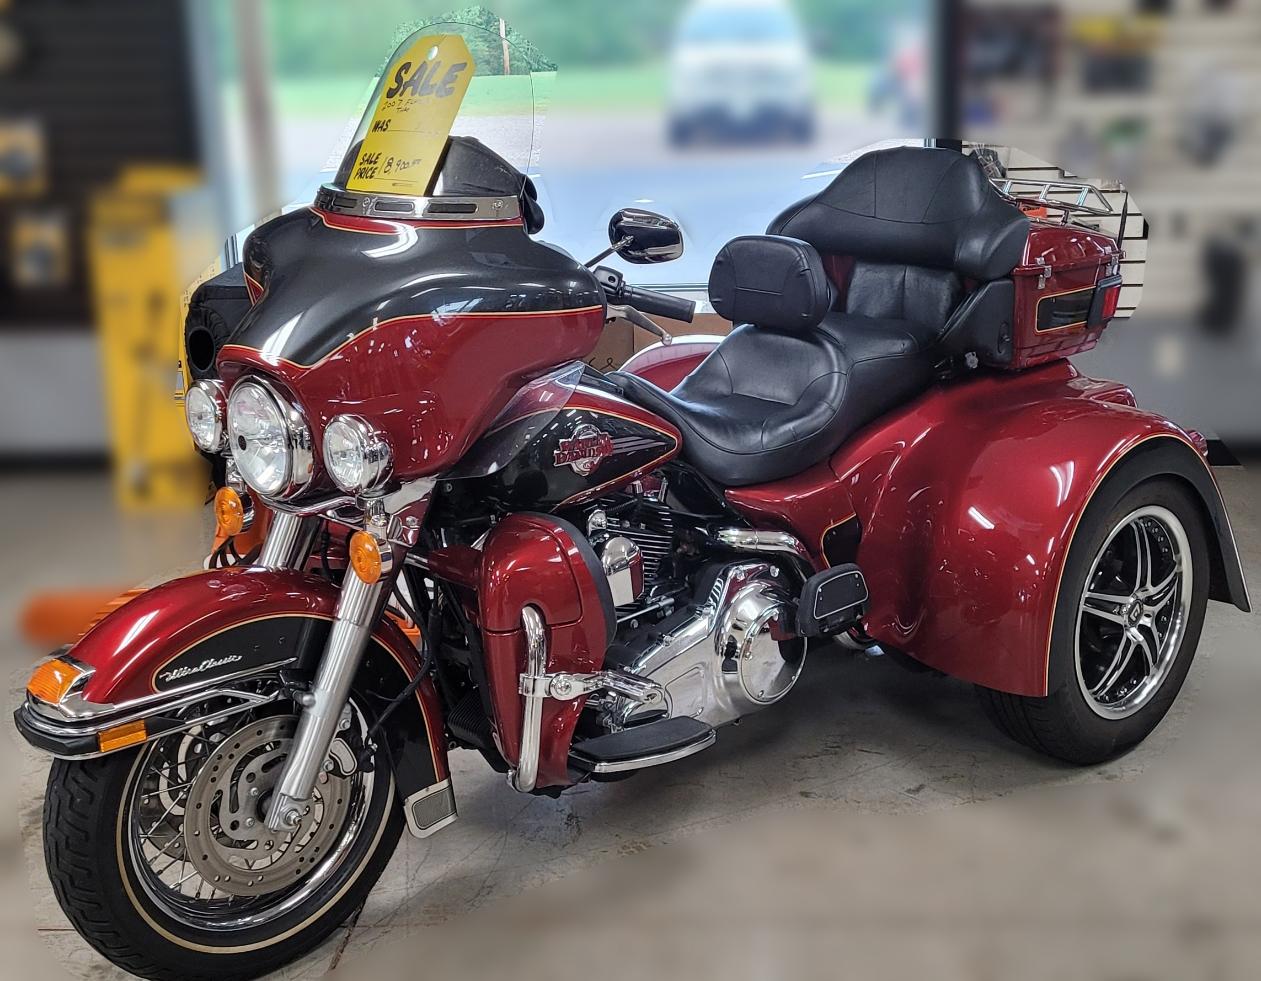 2007 Harley-Davidson Ultra Classic Trike